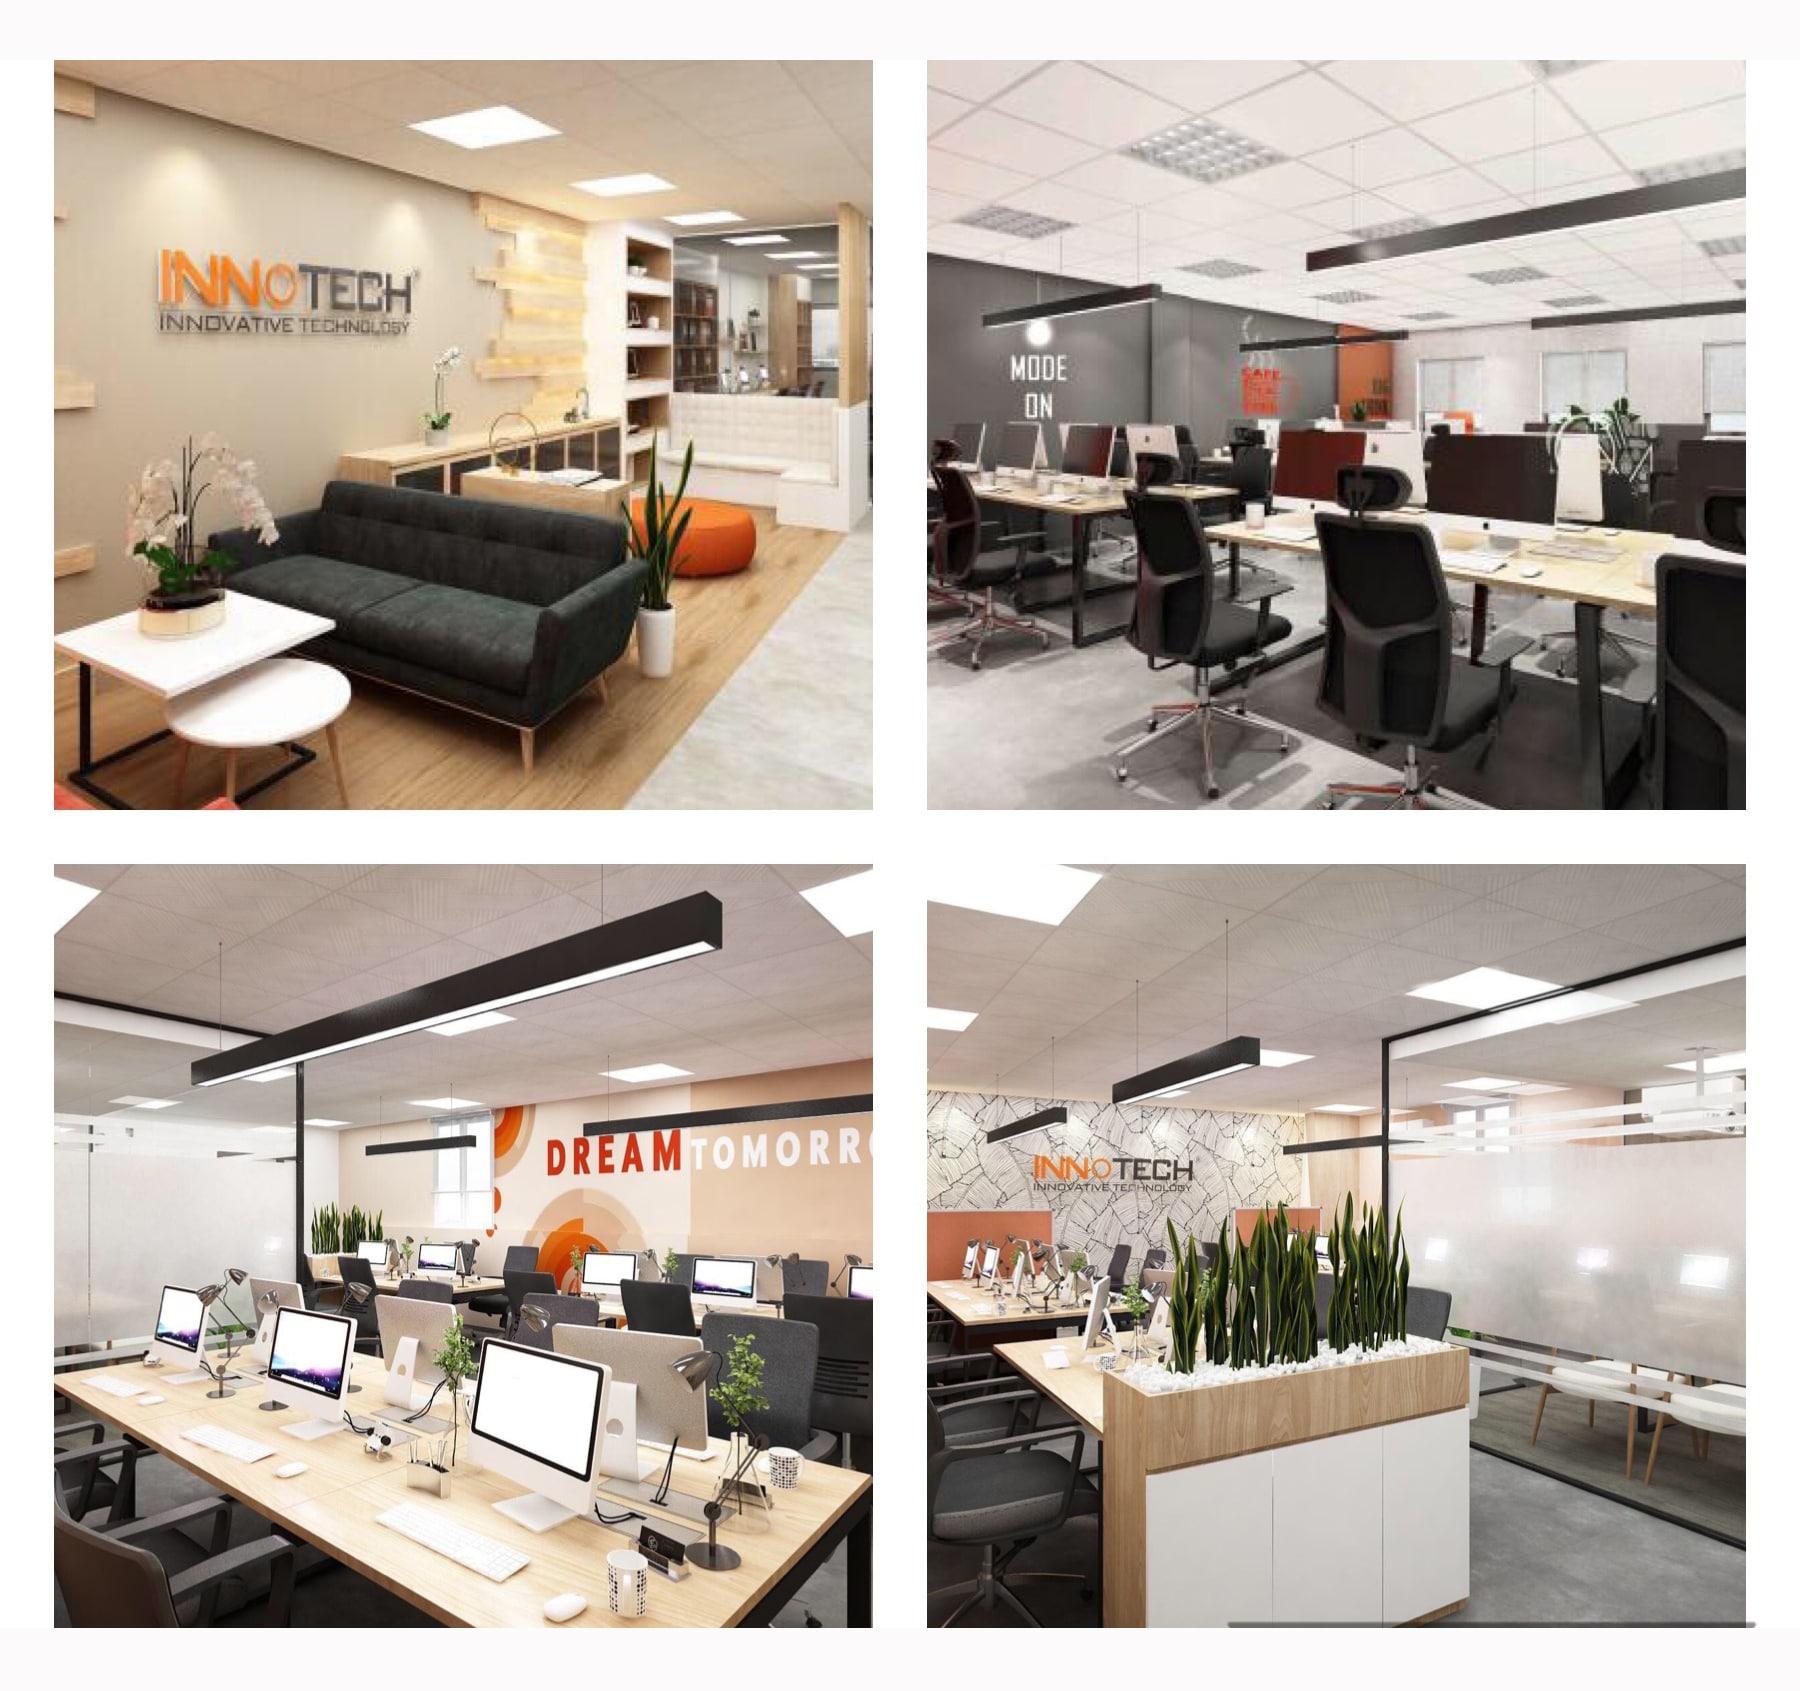 Offshore Software Development Company in Vietnam - Innotech Vietnam